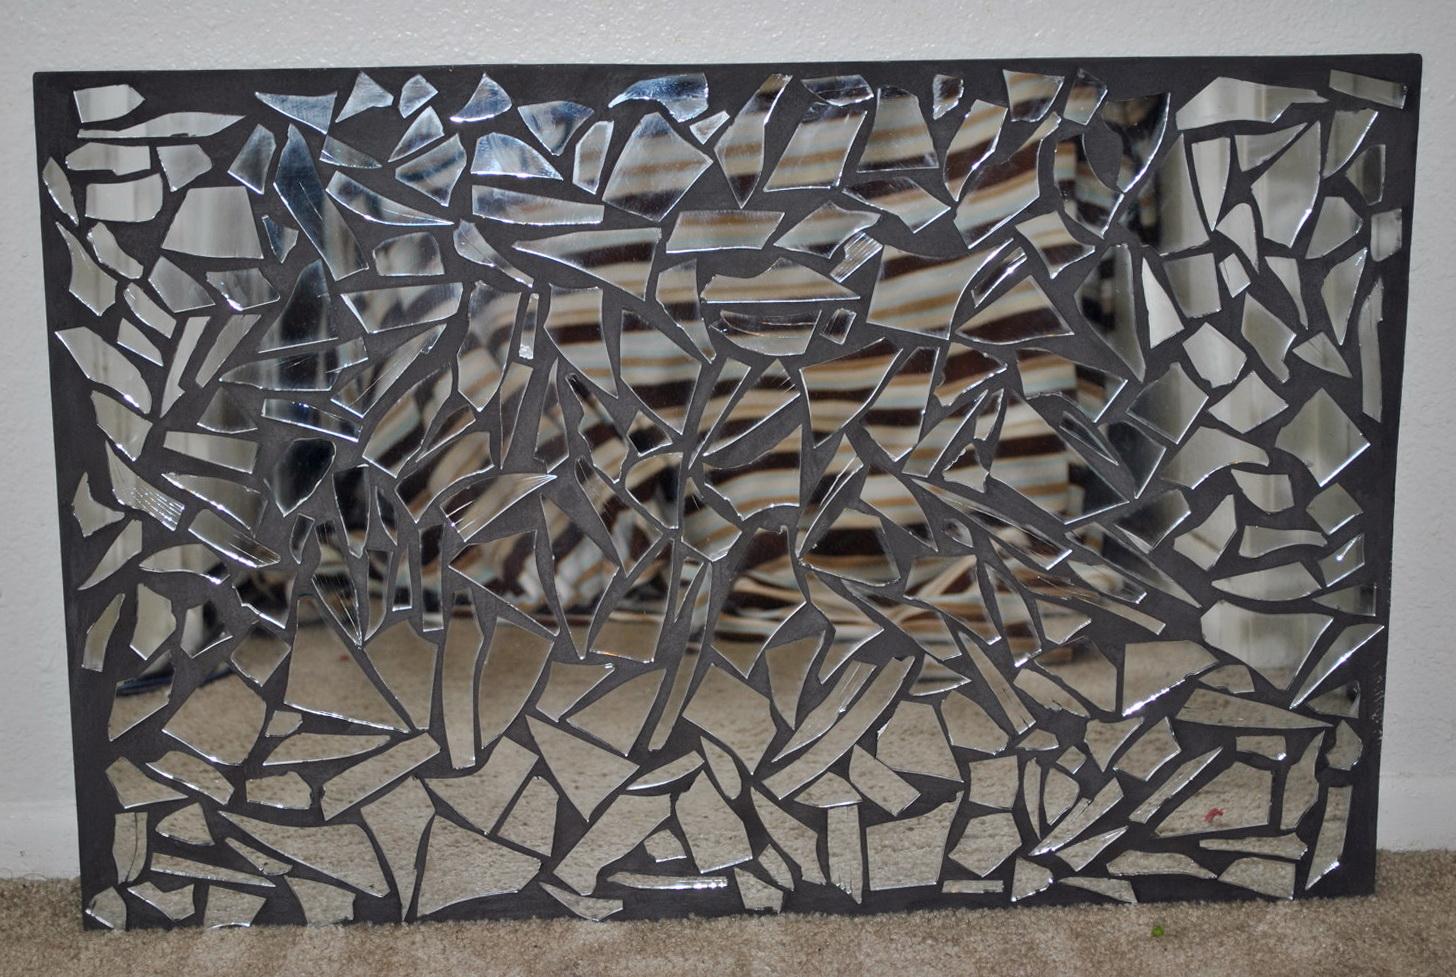 Mirrored Mosaic Wall Art